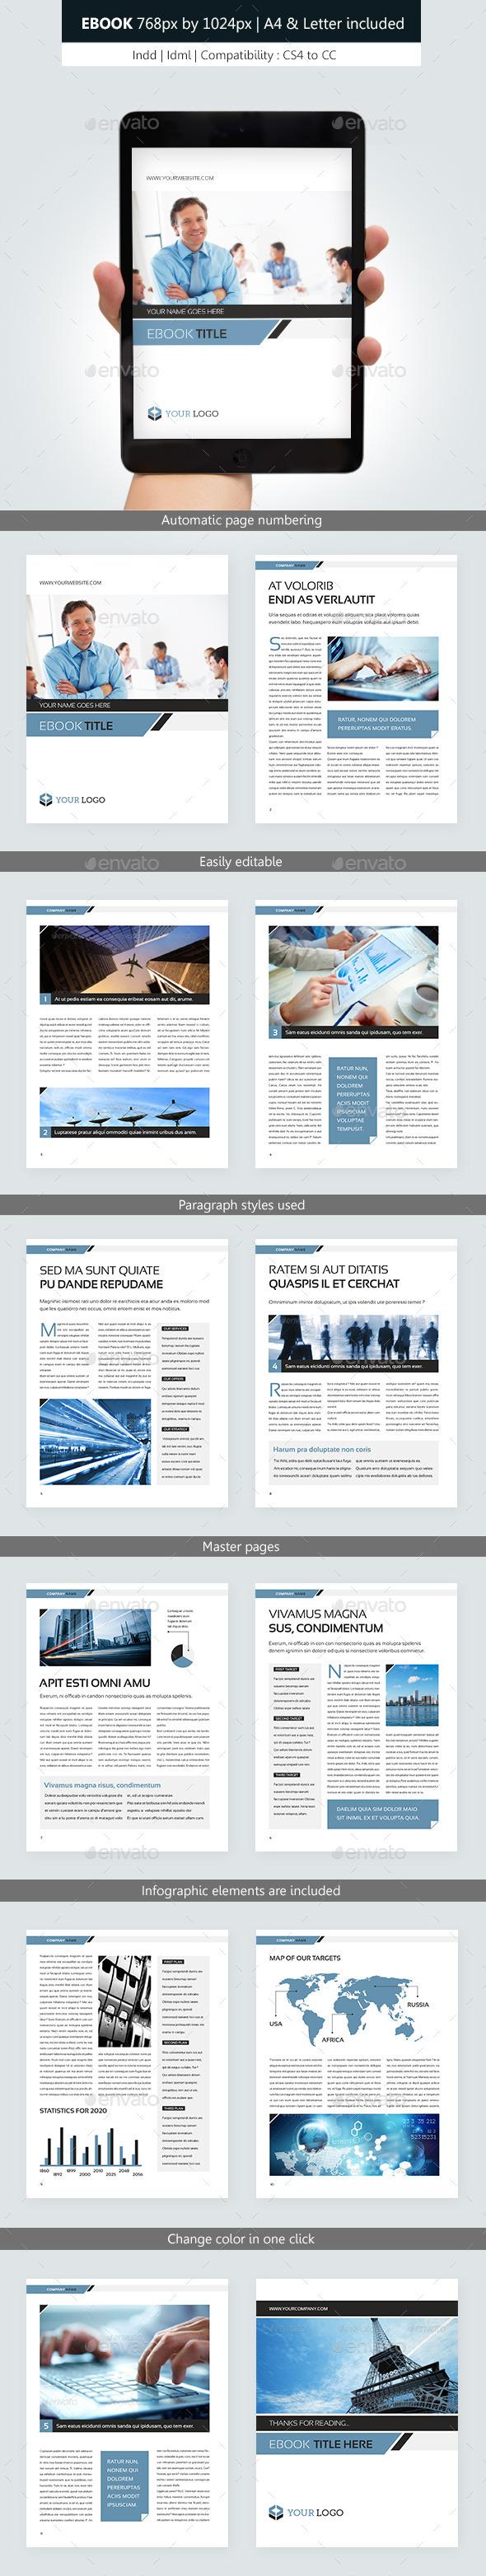 Corporate Ebook Template Design - Digital Books ePublishing